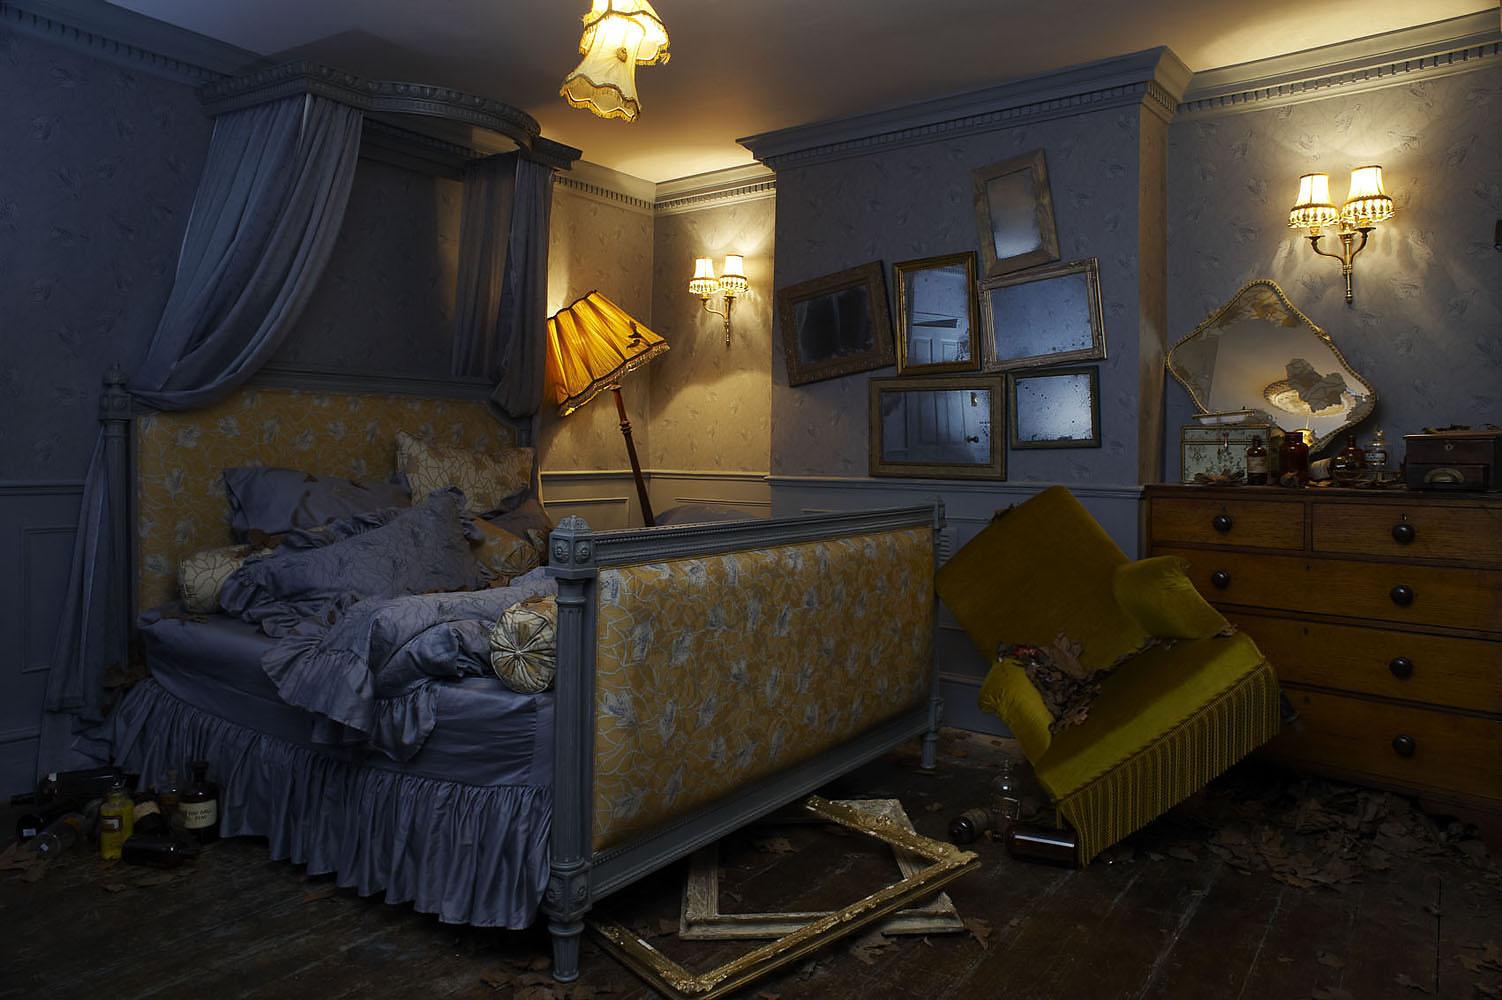 Suzanne Beirne | House of Hackney - Suzanne Beirne